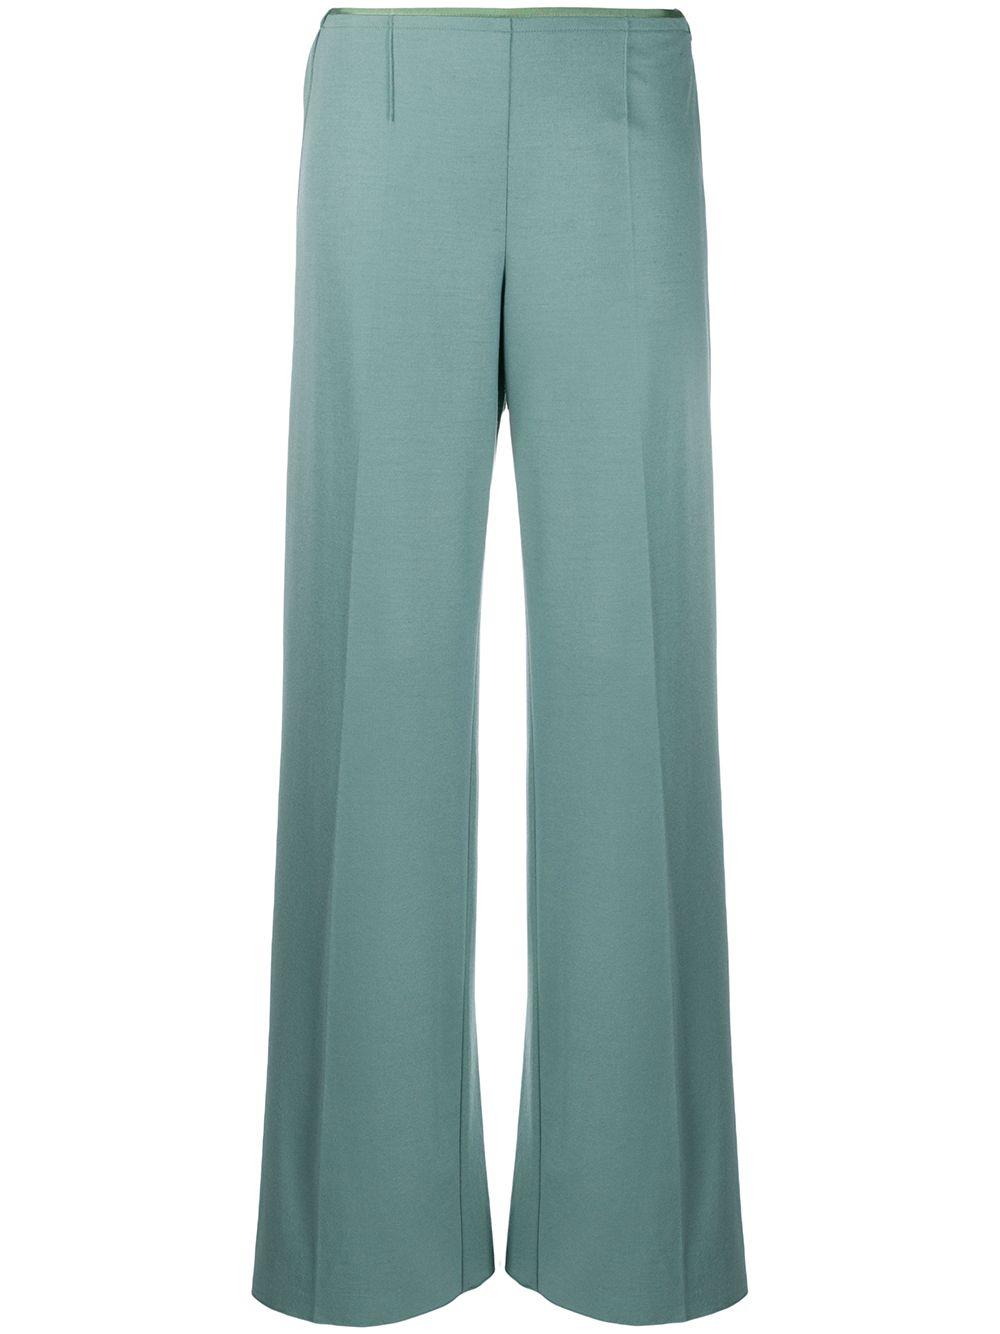 Blue virgin wool blend low-waist straight trousers  FORTE_FORTE |  | 6738CARTA ZUCCHERO